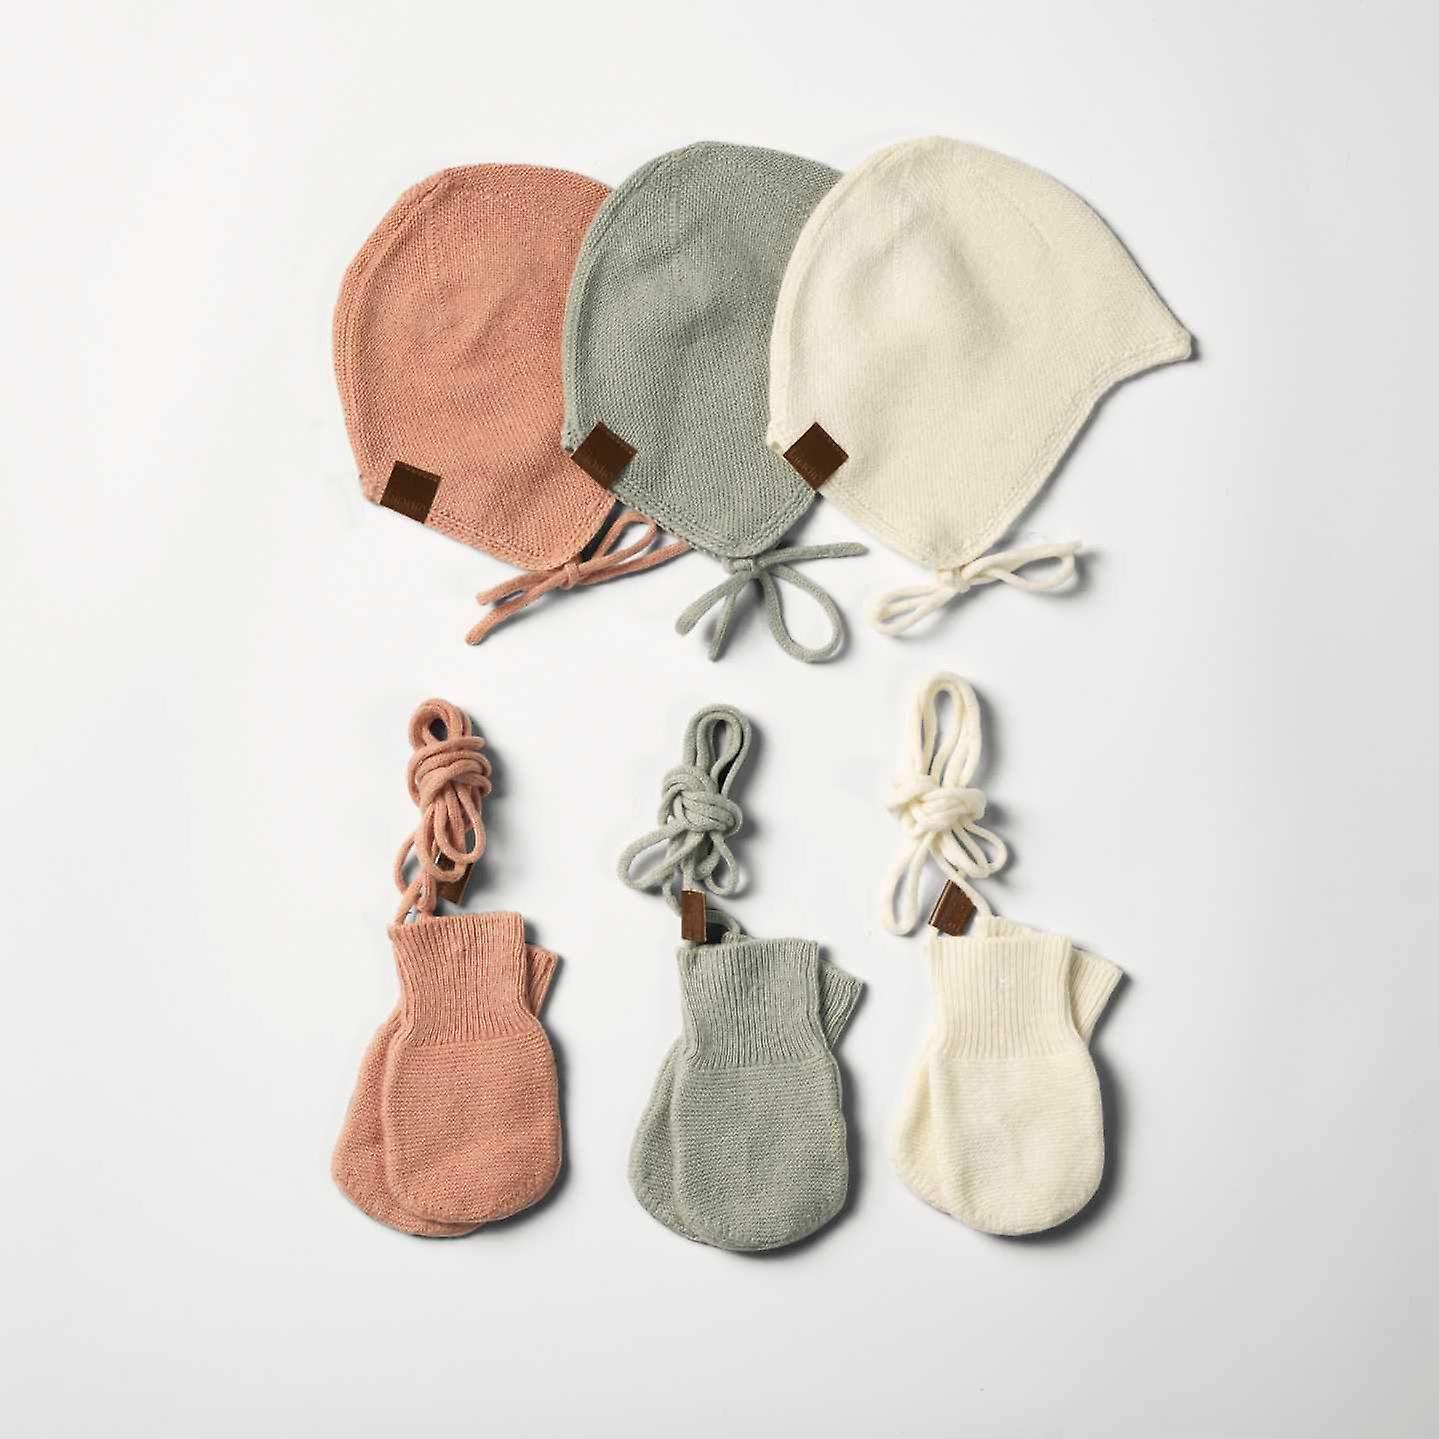 Dettagli Elodie - berretto vintage - bianco vaniglia